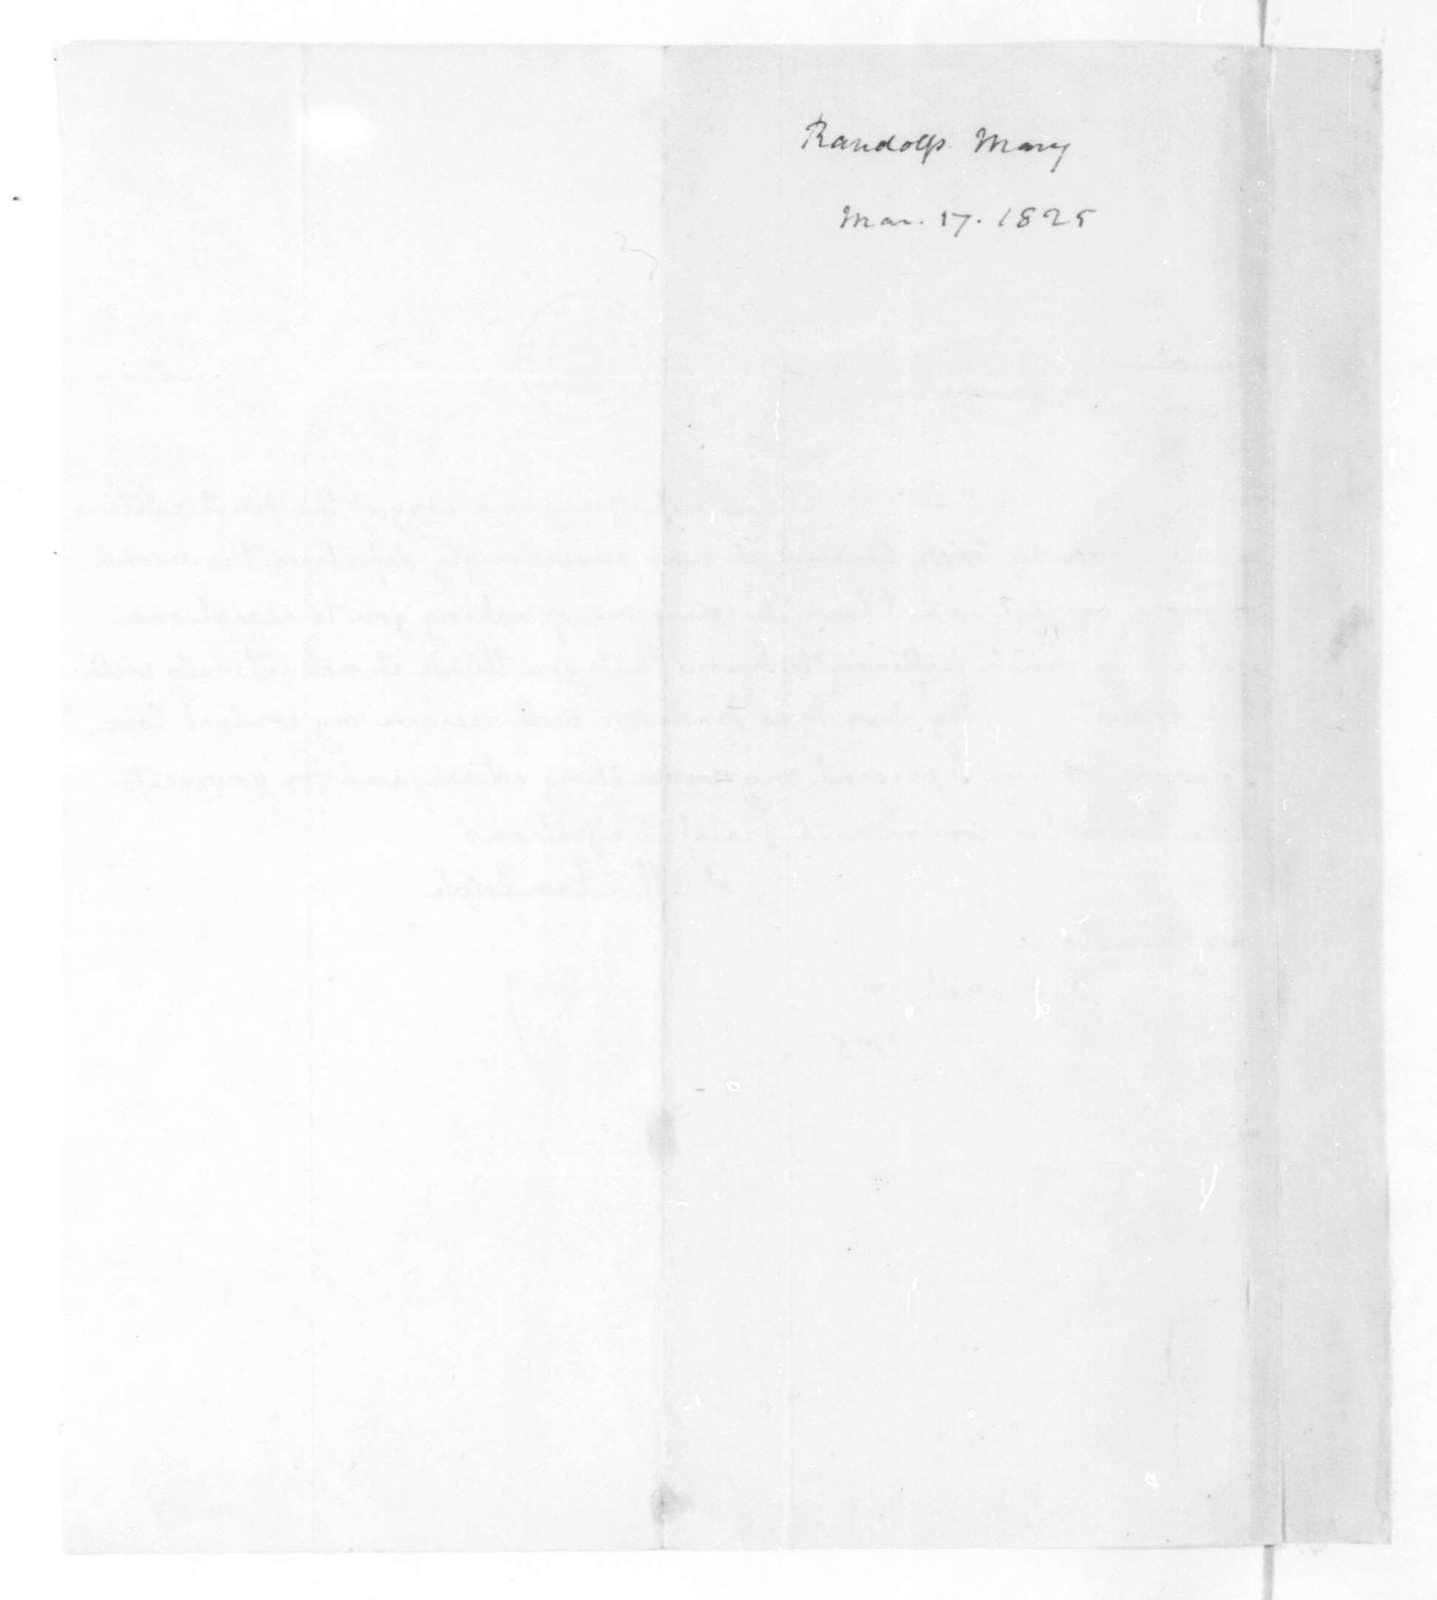 Mary Randolph to James Madison, March 17, 1825.